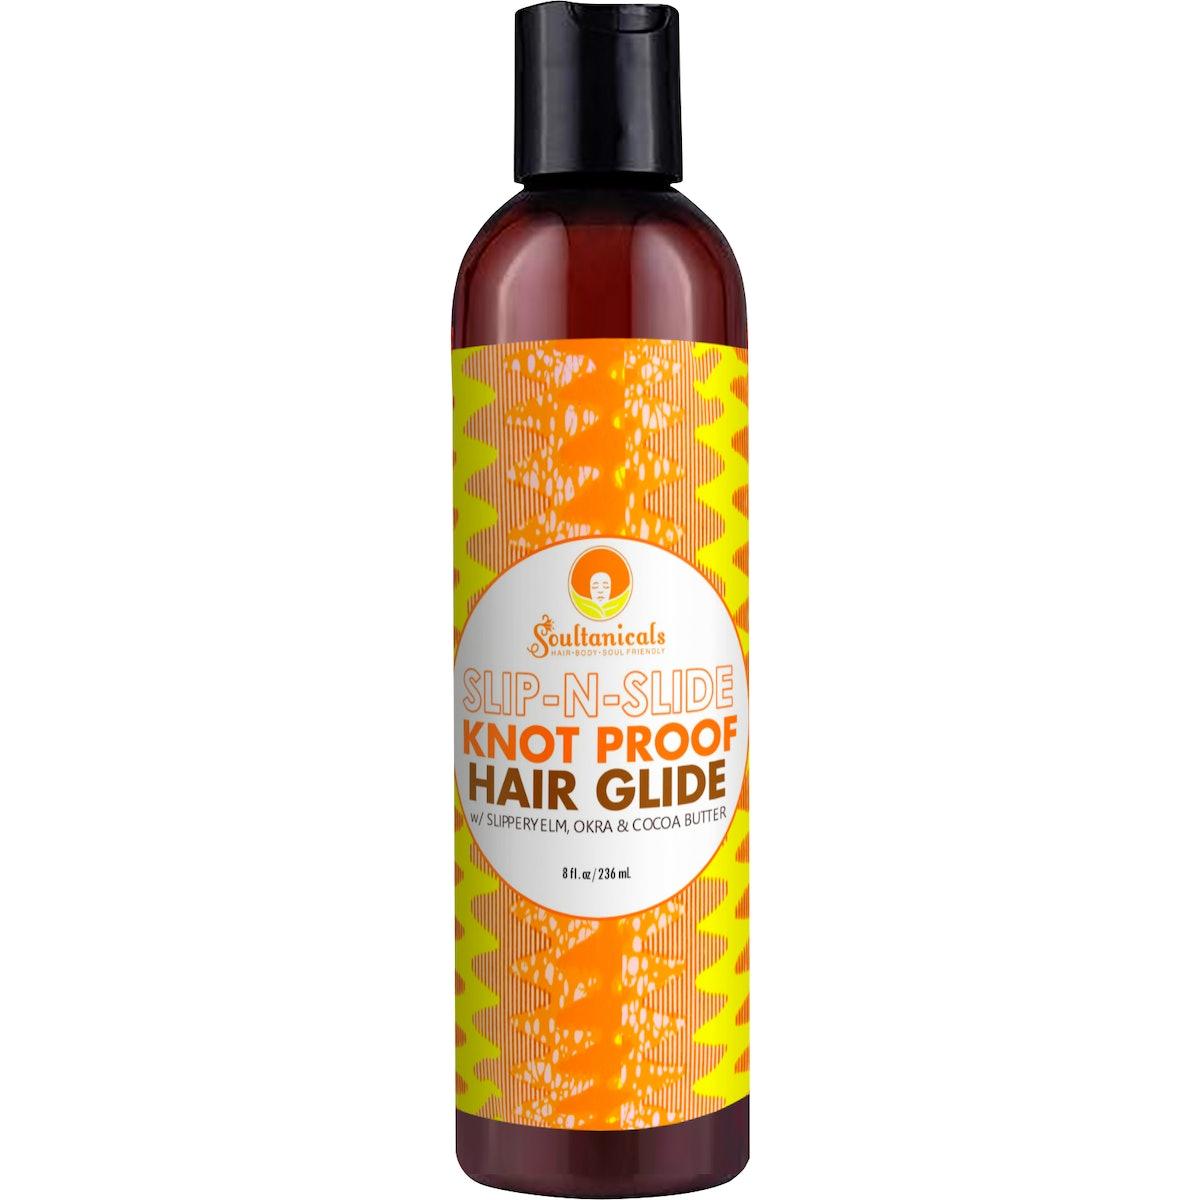 Soultanicals Slip-n-Slide, Knot-Proof Hair Glide